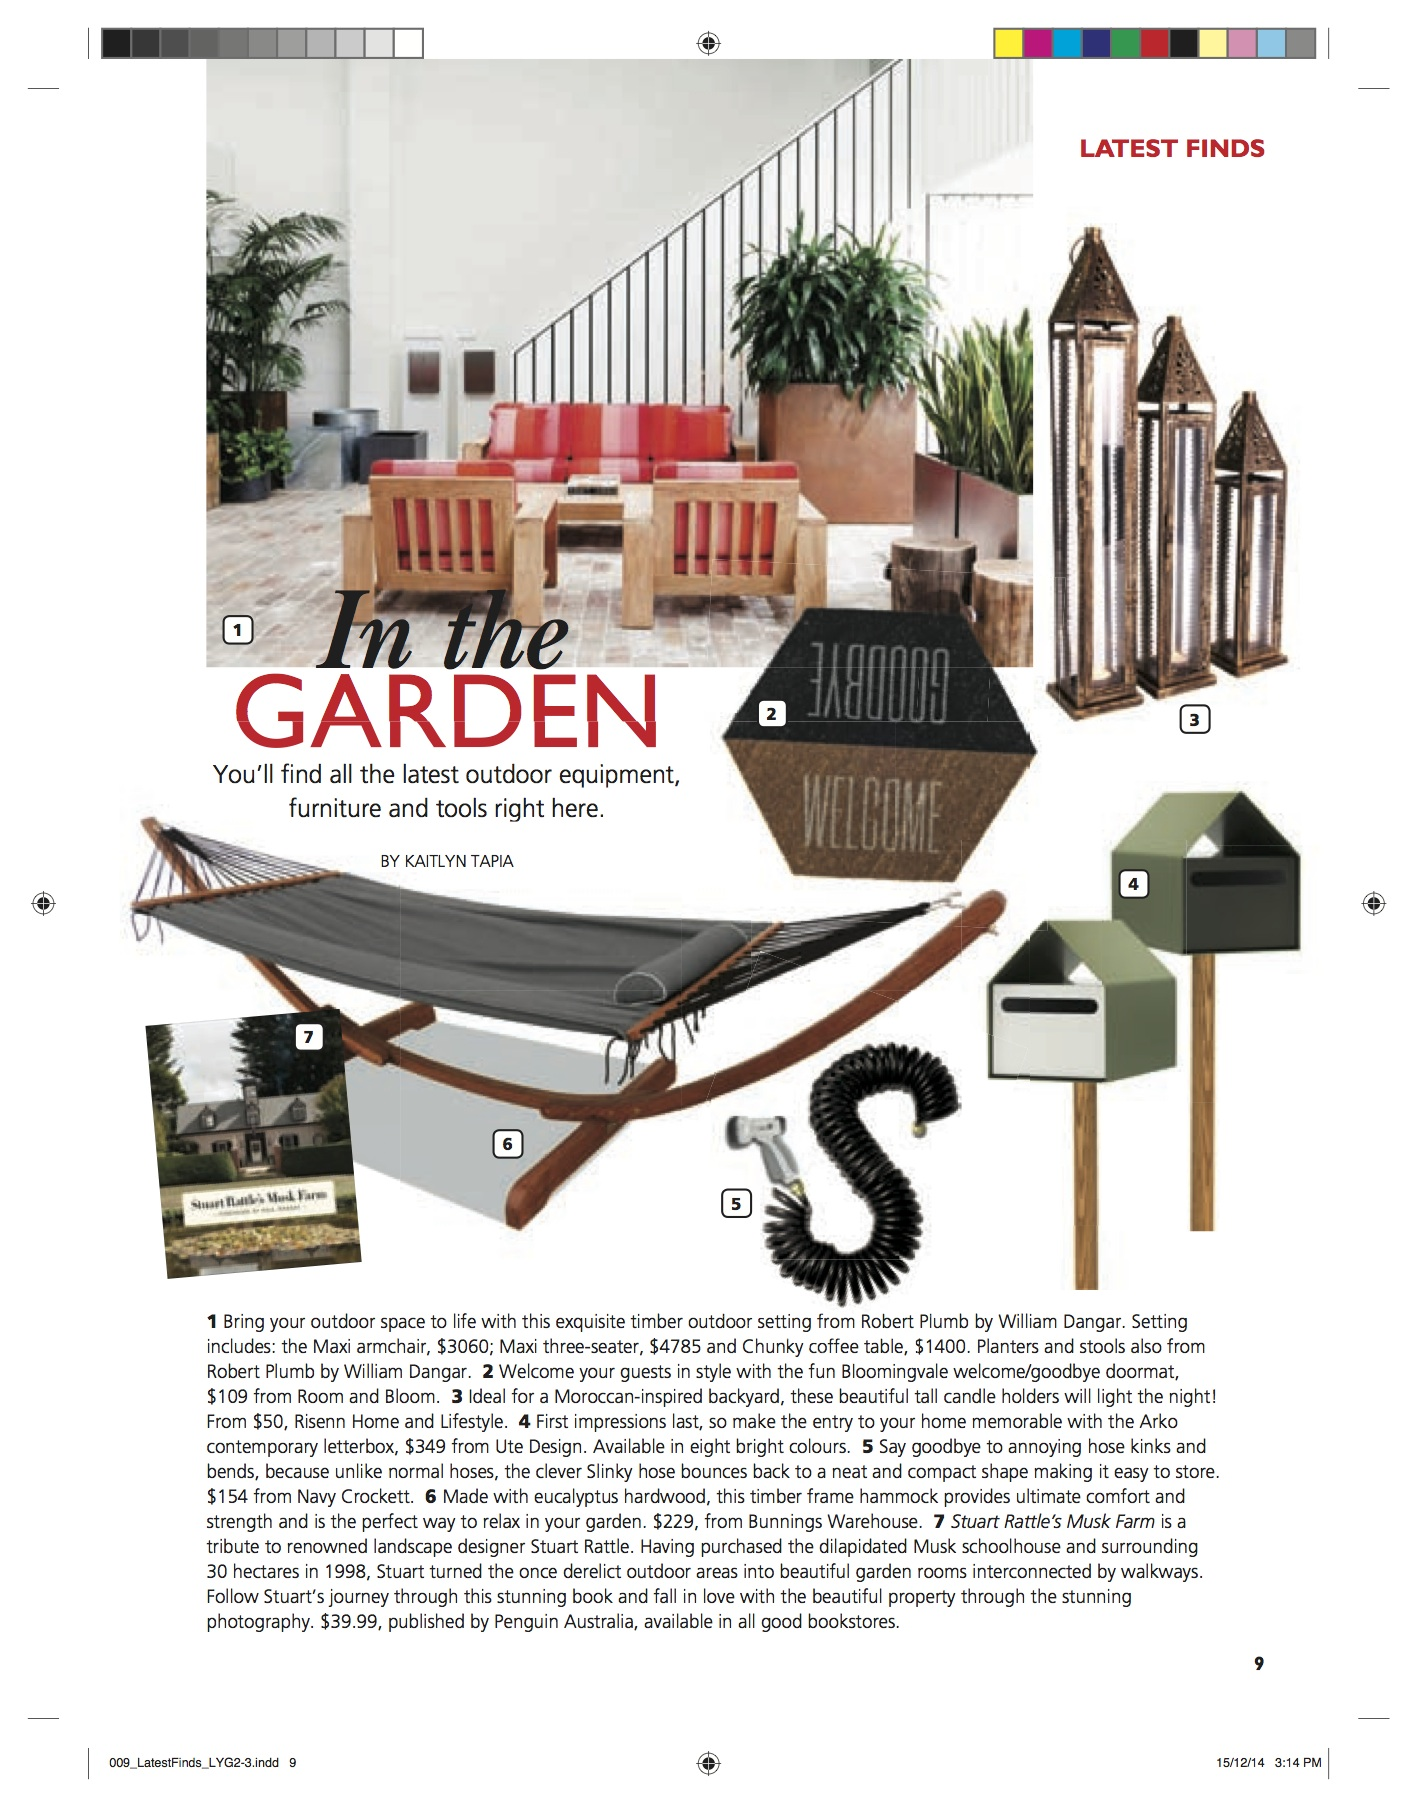 009-landscaping-your-garden-2-3-lr-copy.jpg